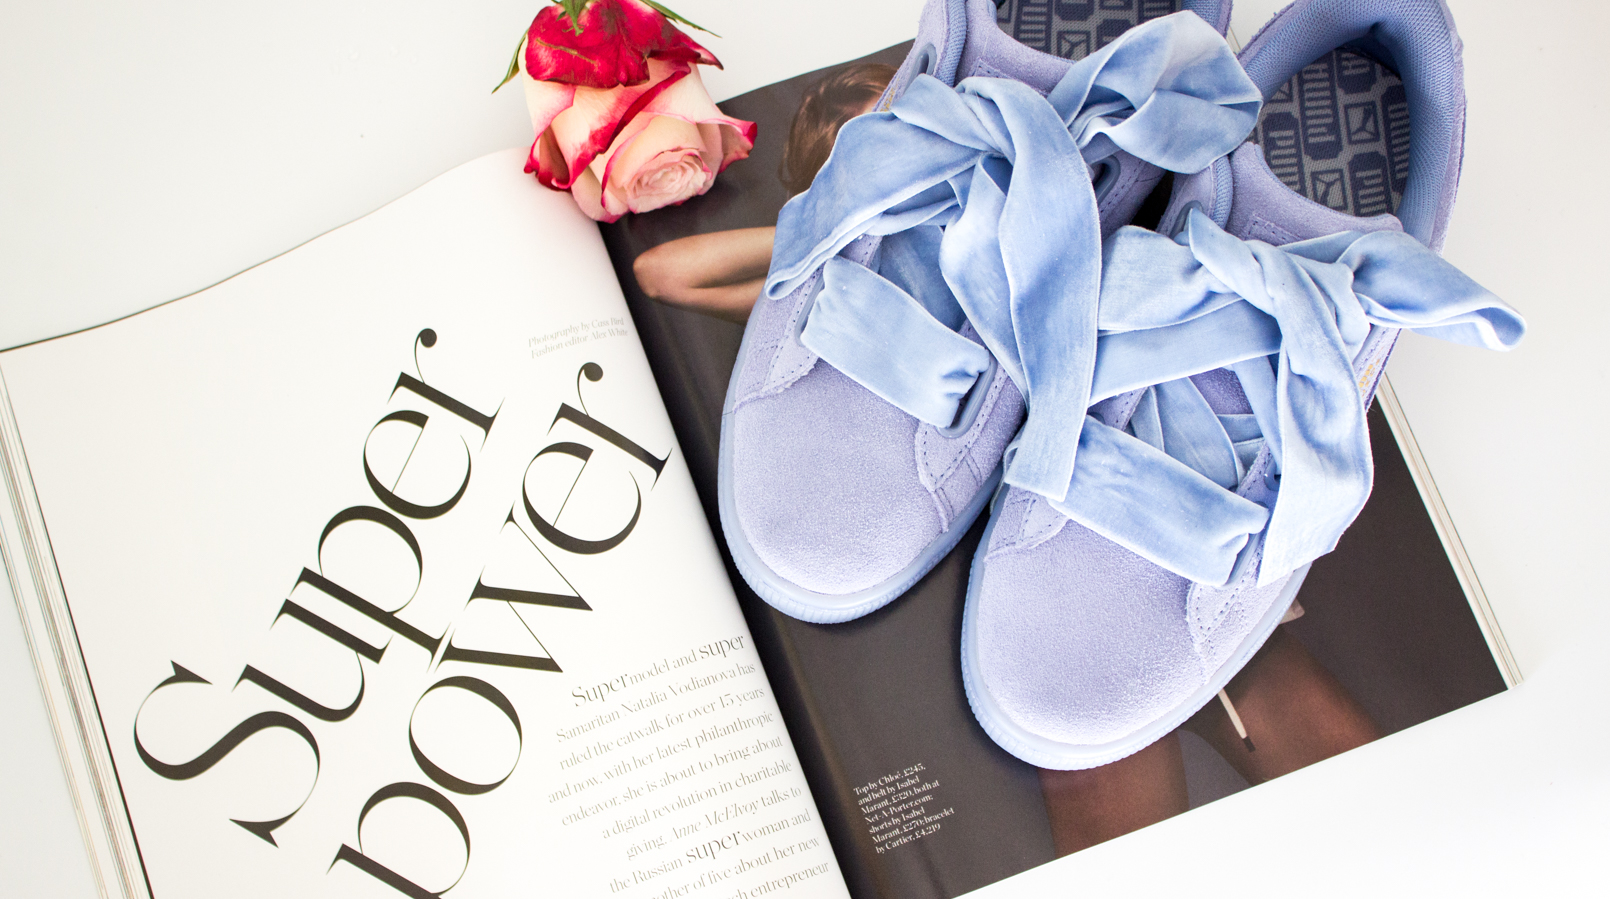 Le Fashionaire New In: Puma Suede Heart blogger catarine martins puma suede heart lavender velvet sneakers blue porter magazine spring pink rose 5135F EN